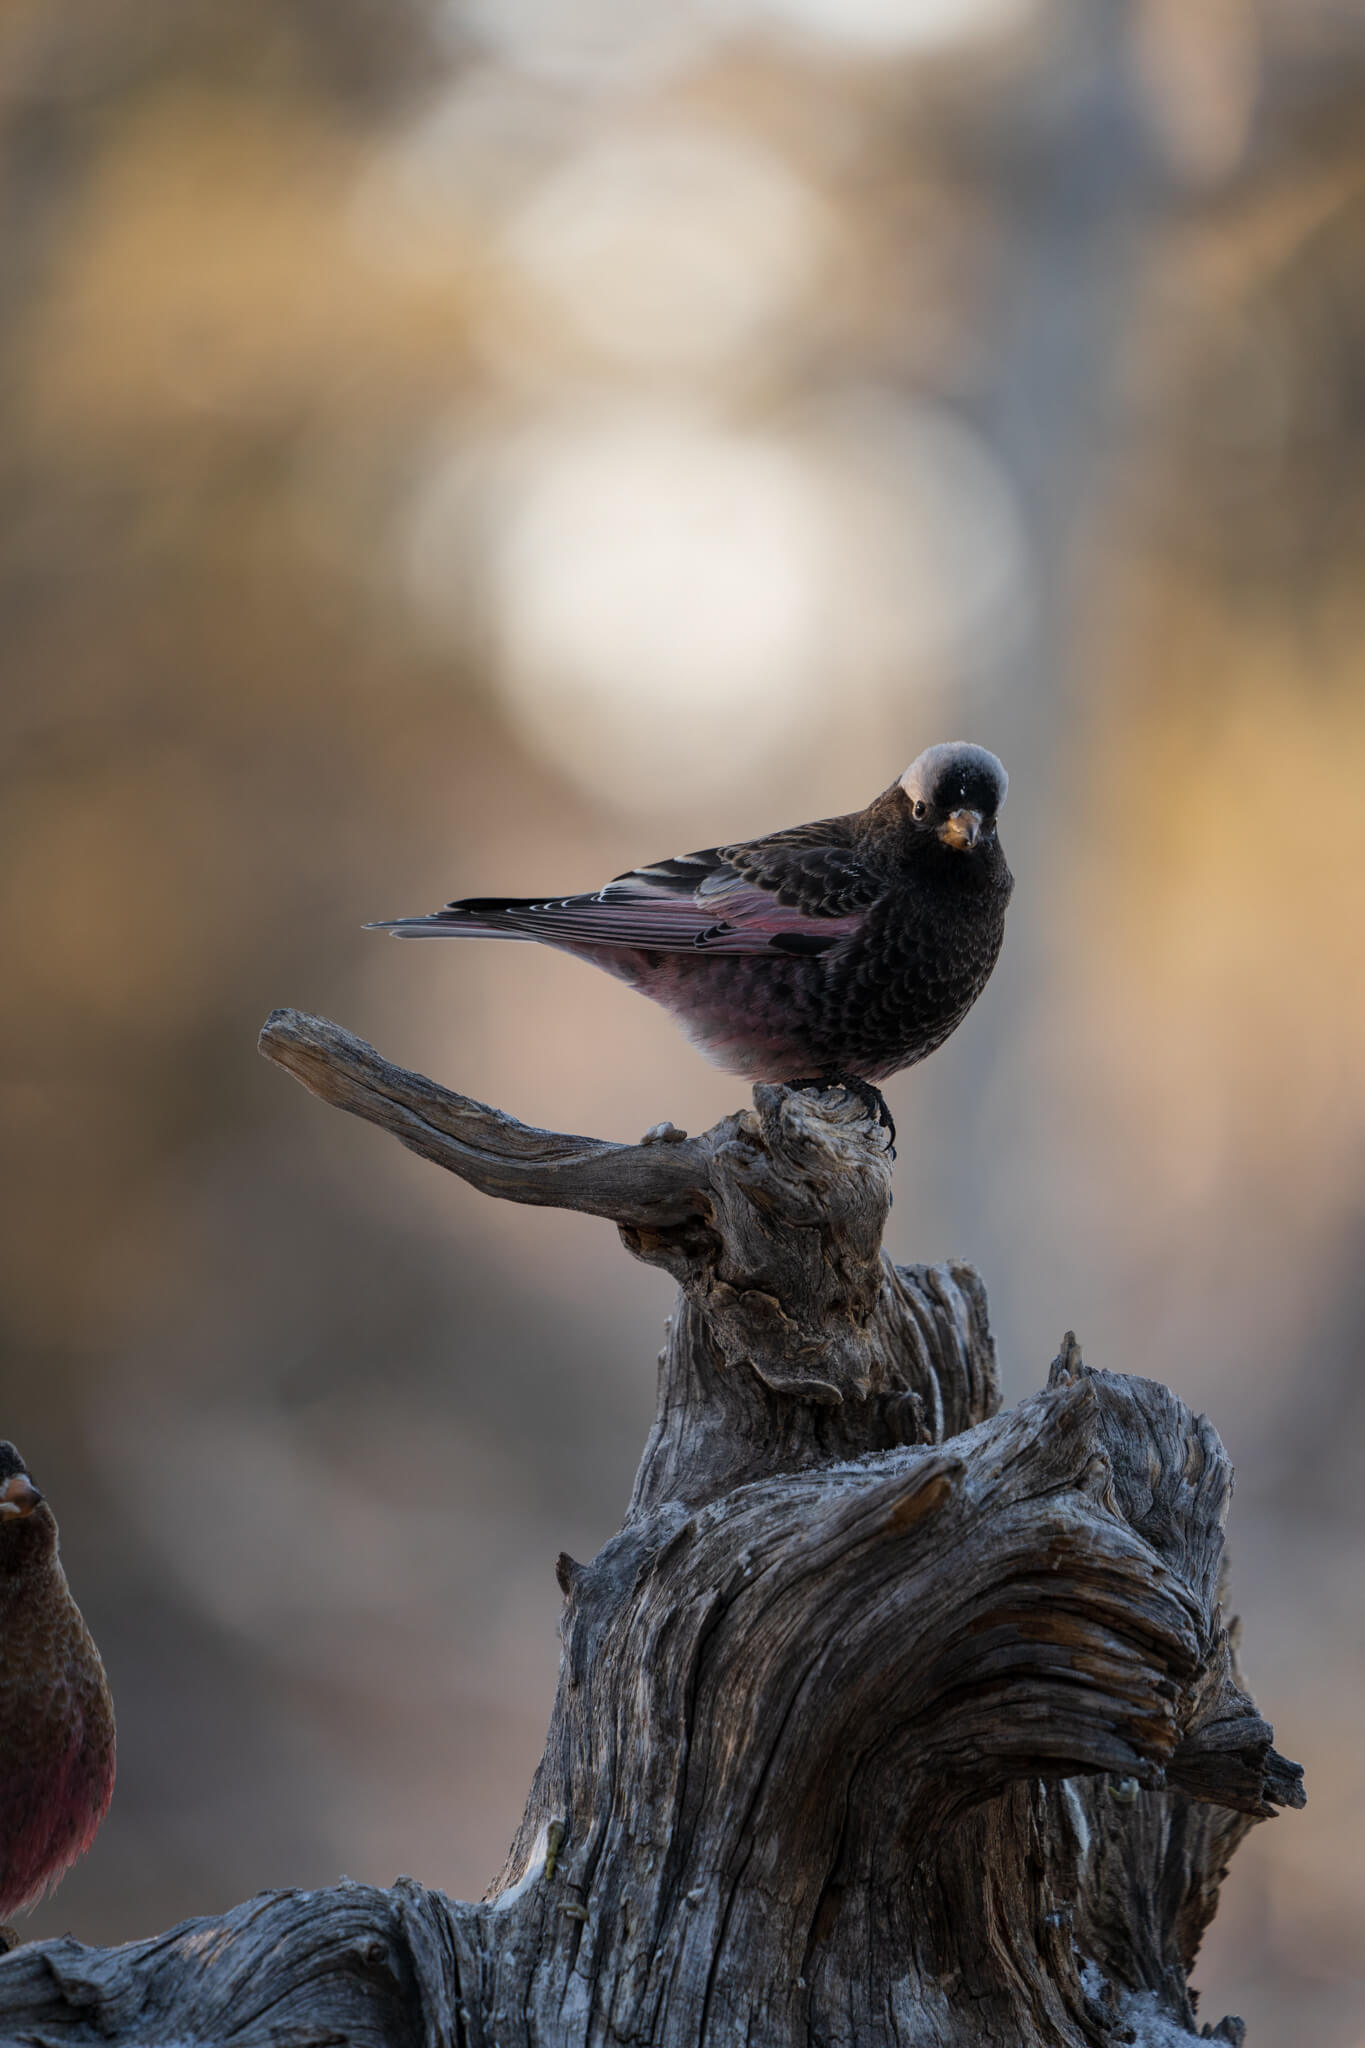 Black Rosy-Finch, Tarryall, CO, January 10, 2021 | Photo: Brandt Ryder